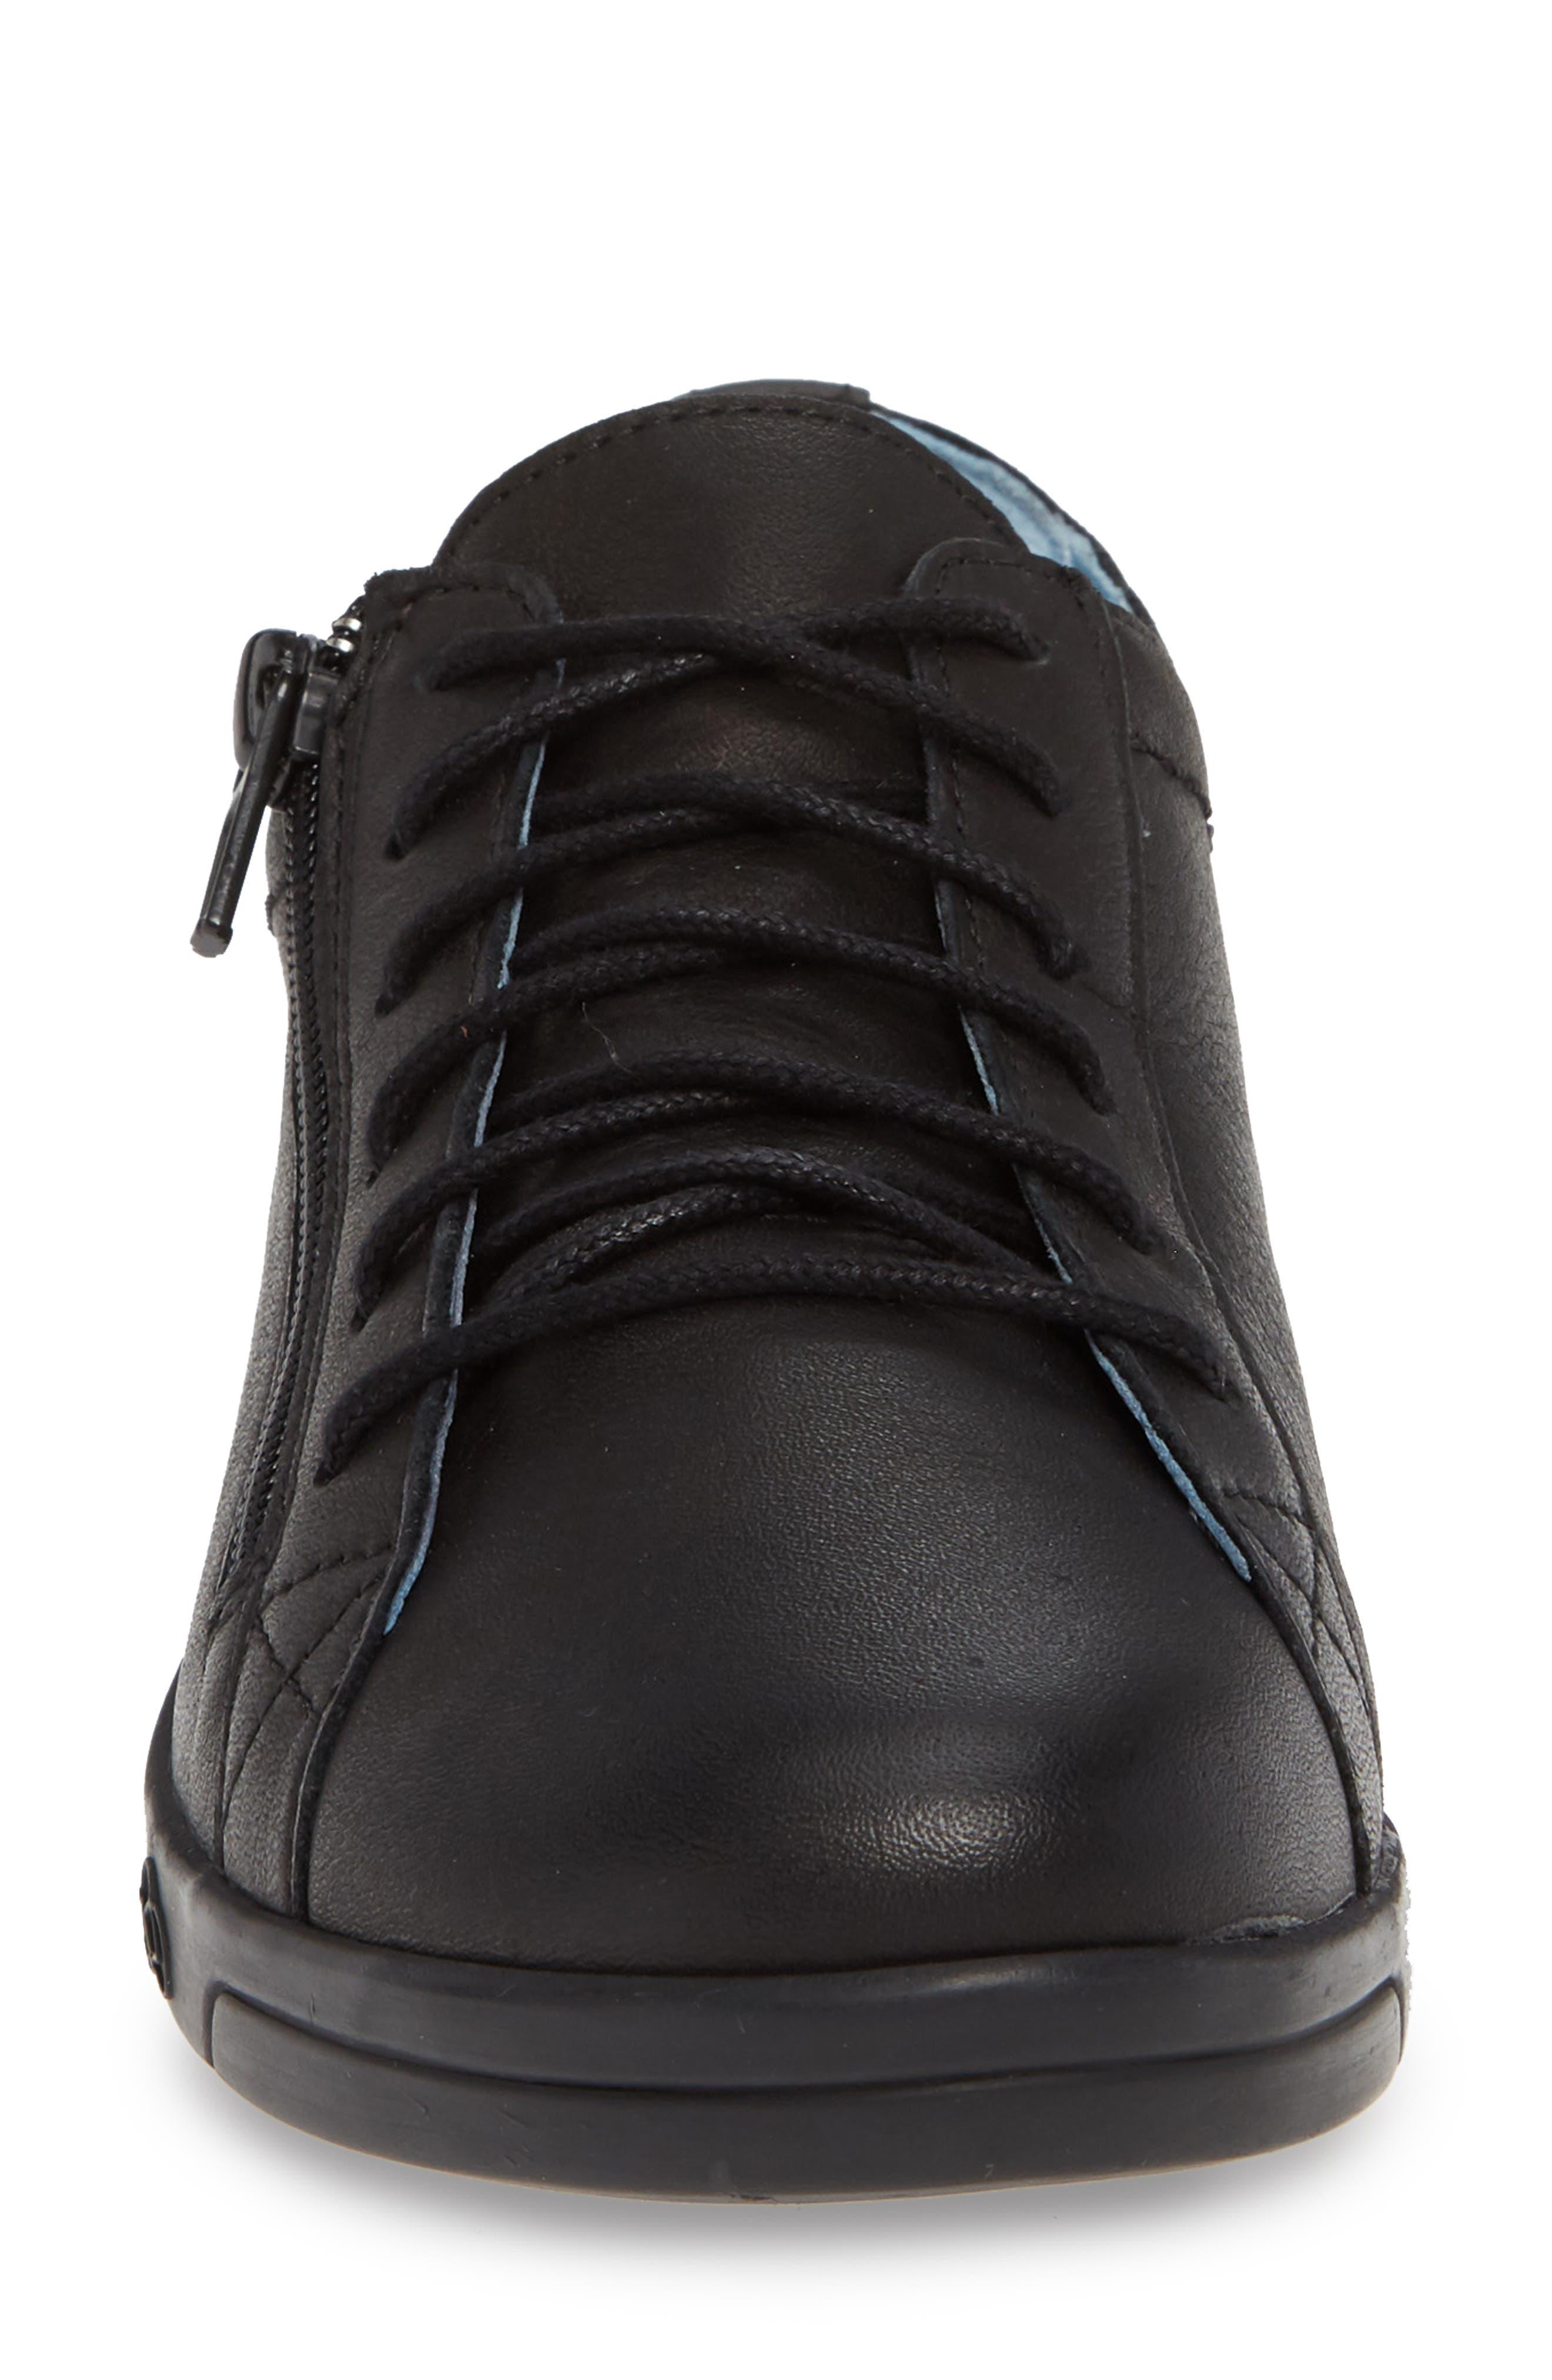 CLOUD, 'Aika' Leather Sneaker, Alternate thumbnail 4, color, 004